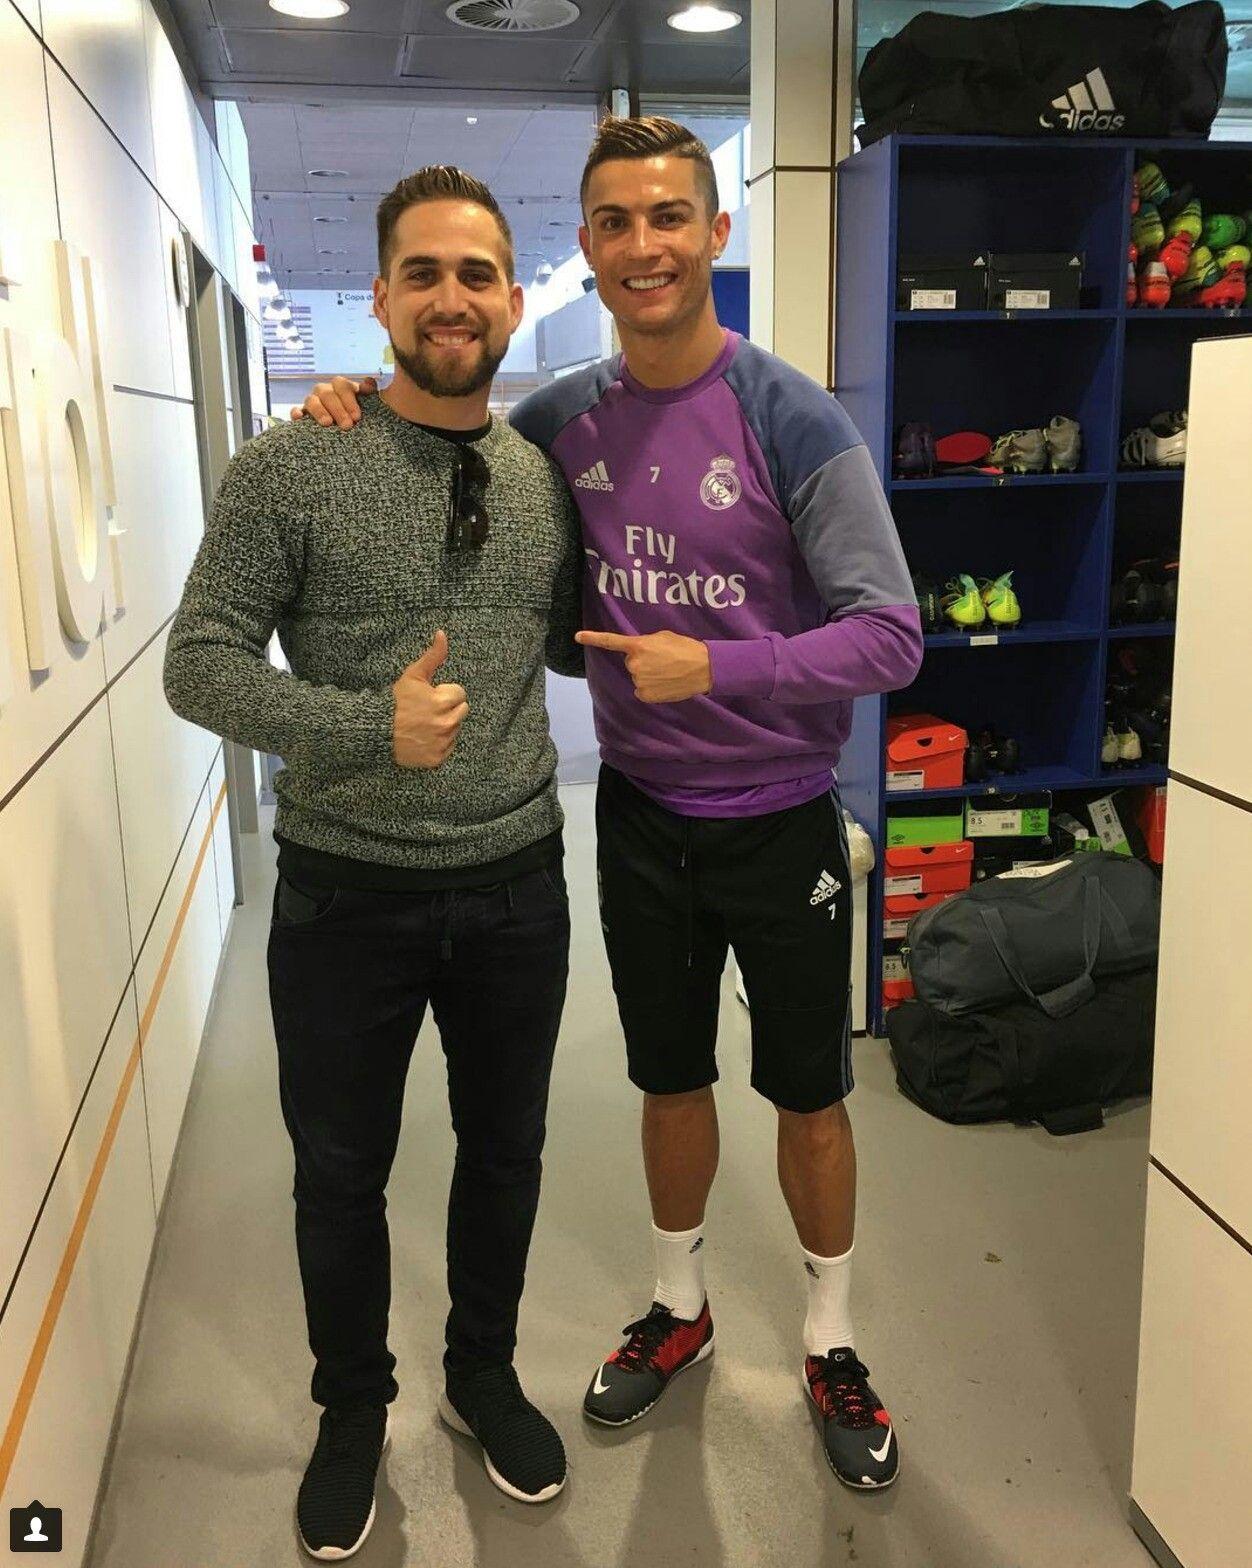 Ender Inciarte and Cristiano Ronaldo